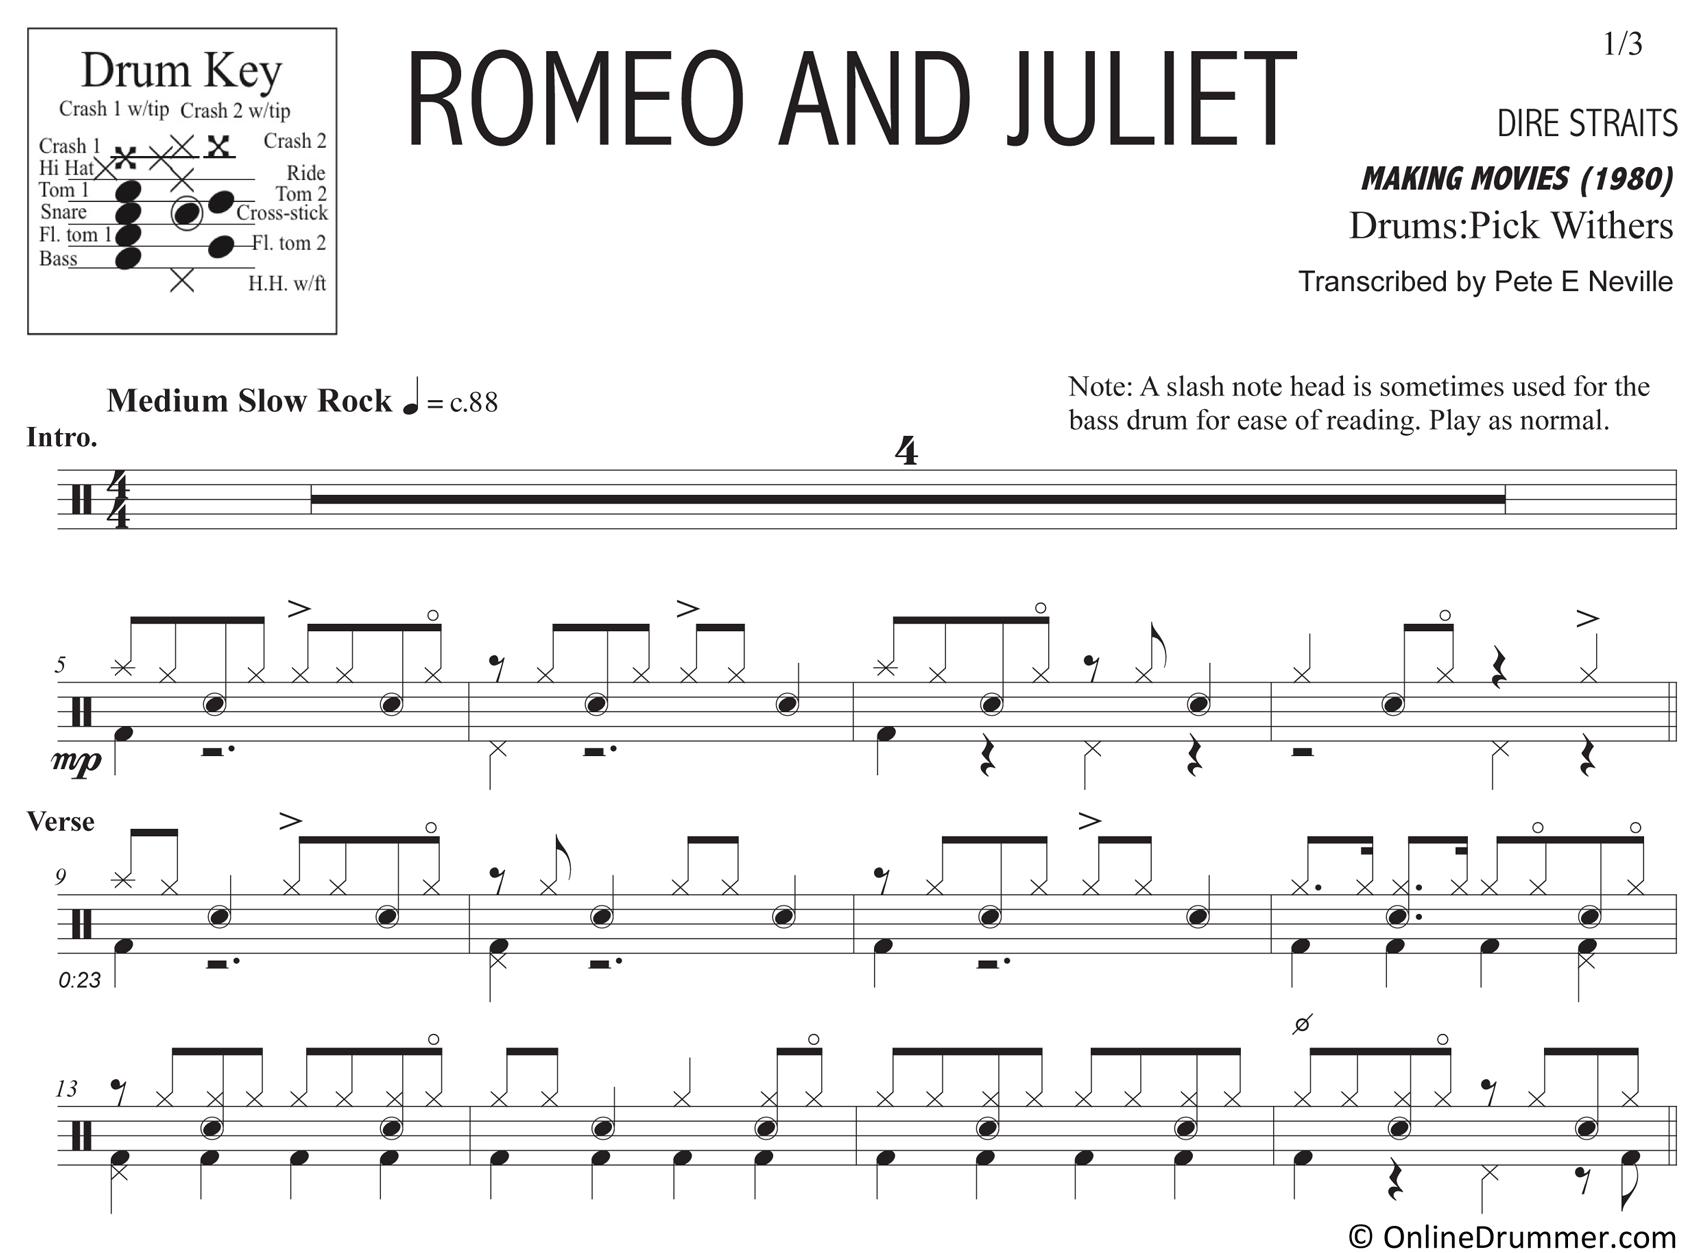 Romeo and Juliet - Dire Straits - Drum Sheet Music